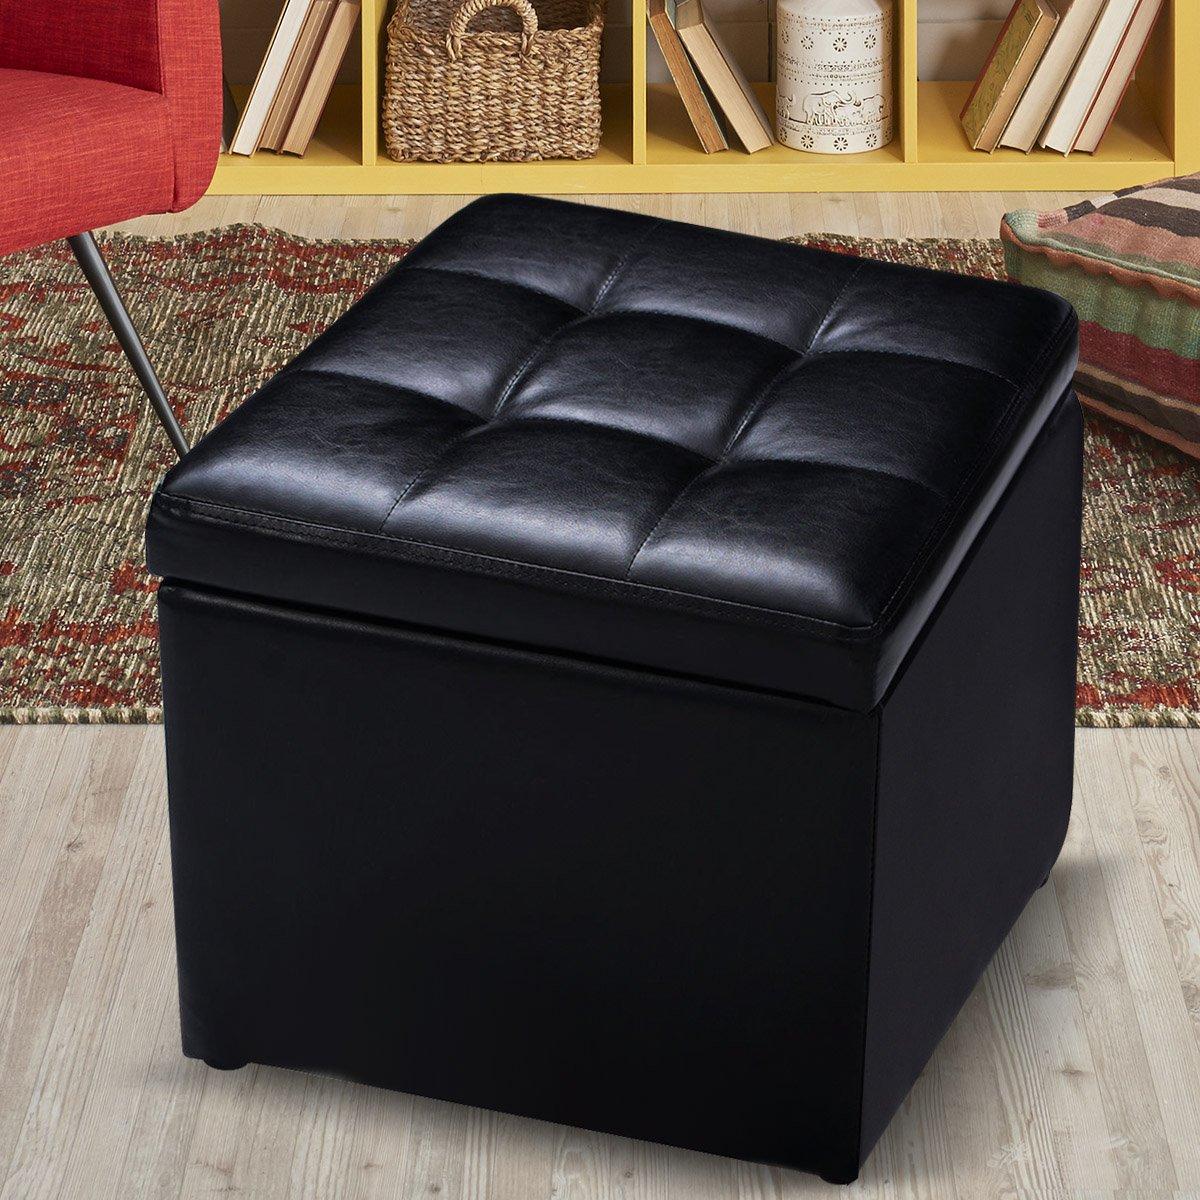 Giantex Cube Ottoman Pouffe Storage Box Lounge Seat Footstools with Hinge Top (Black)